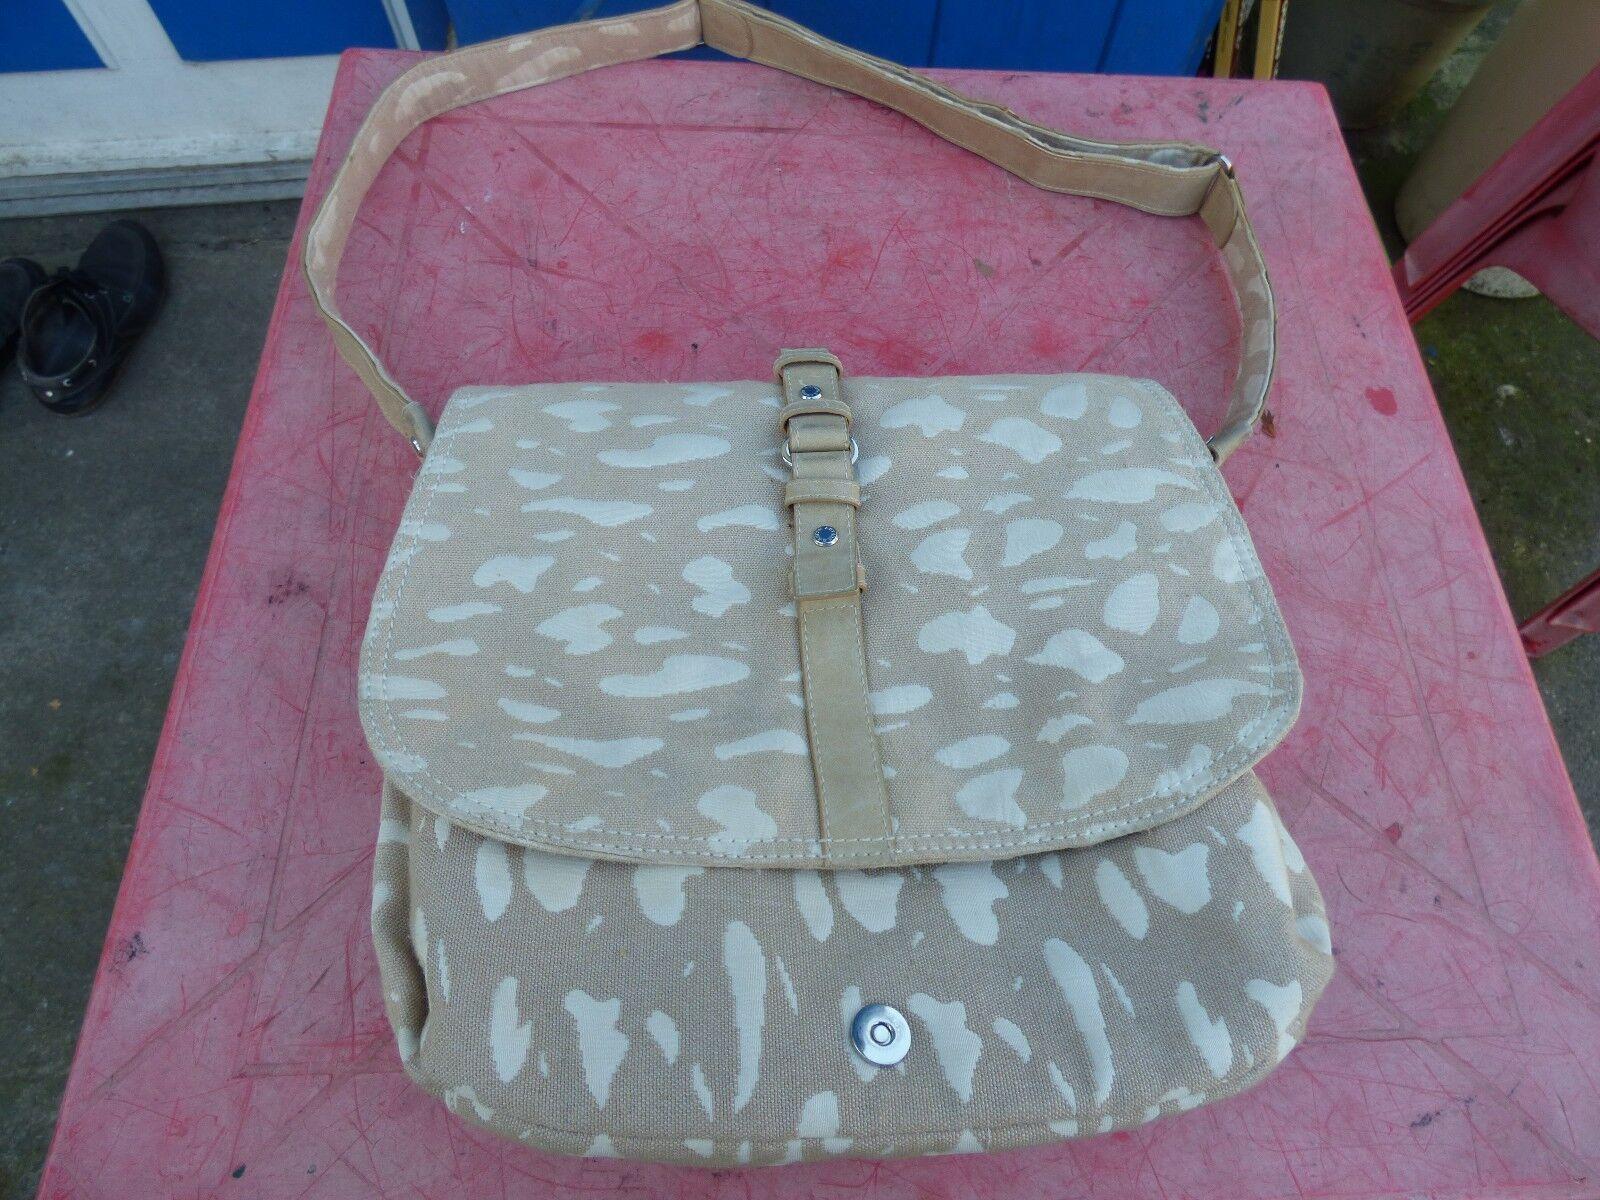 Arthur & Aston Handbag Satchel Canvas Beige Worn Shoulder Strap